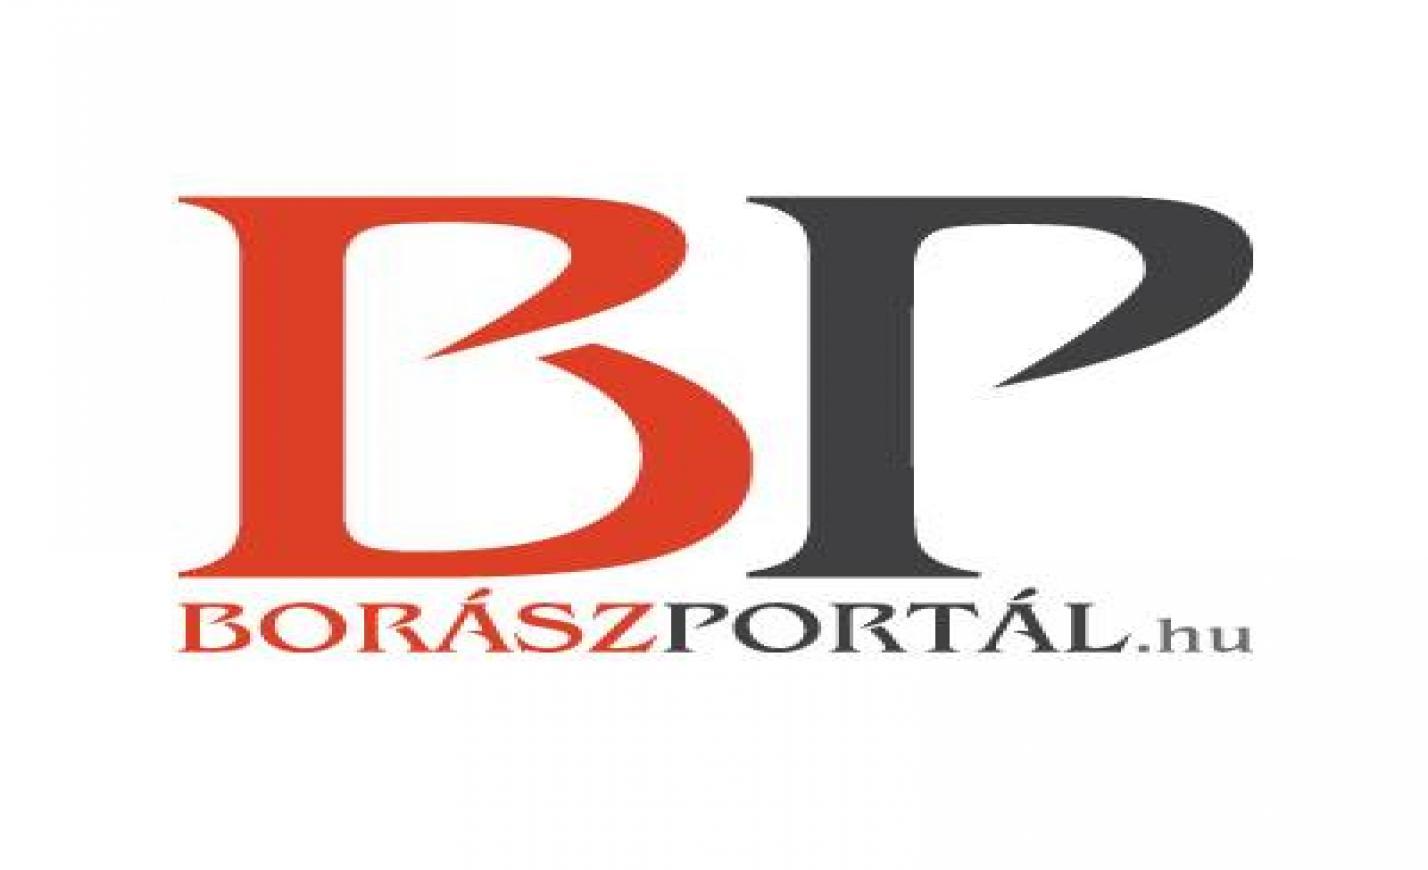 Tokaj pezseg: új programsorozat indul a borvidéken